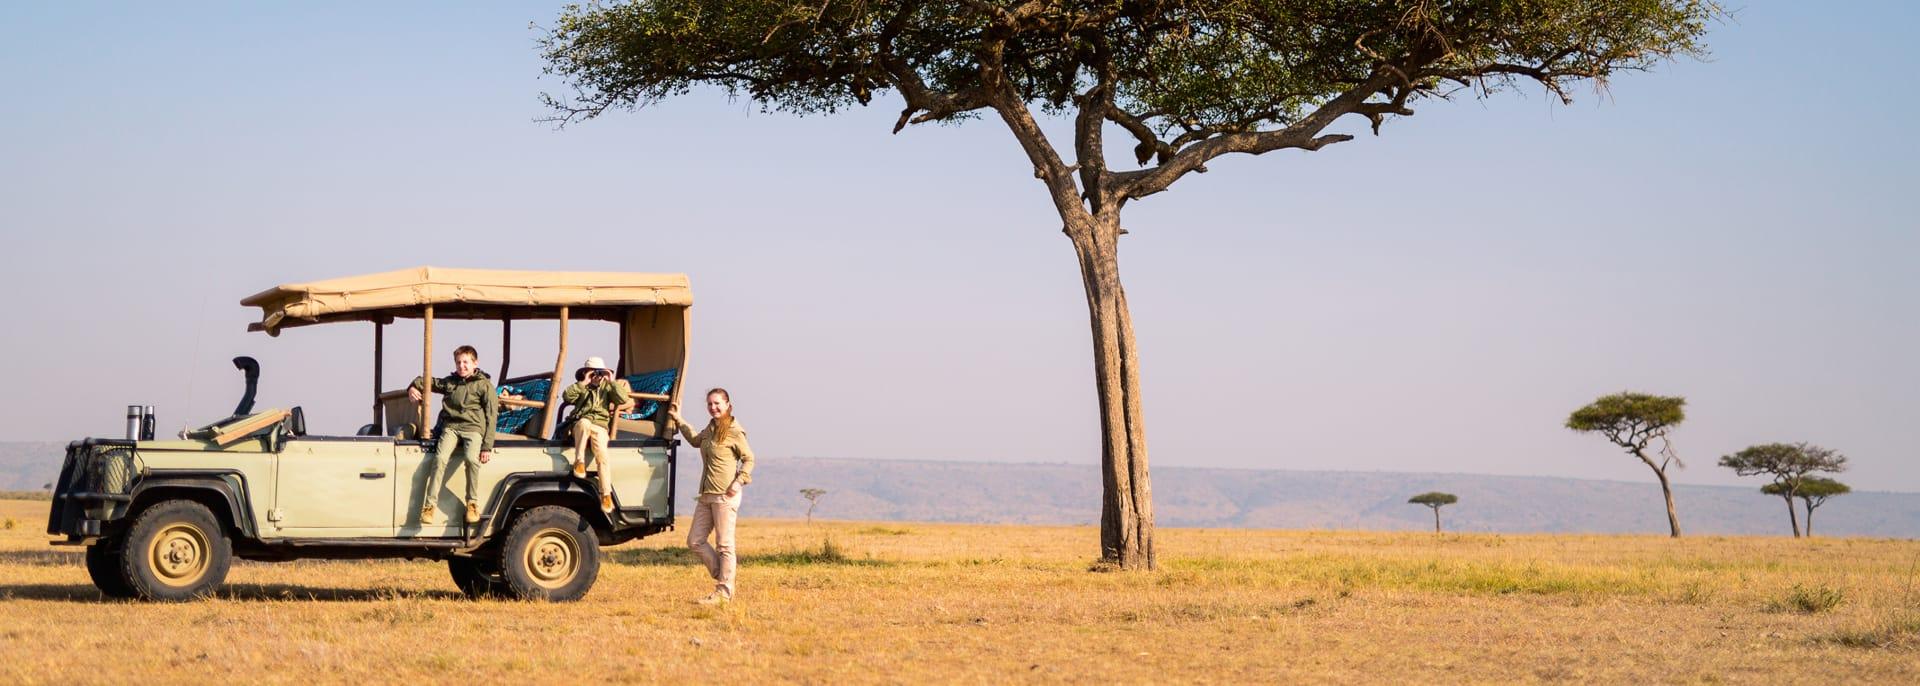 Safari, Kenia